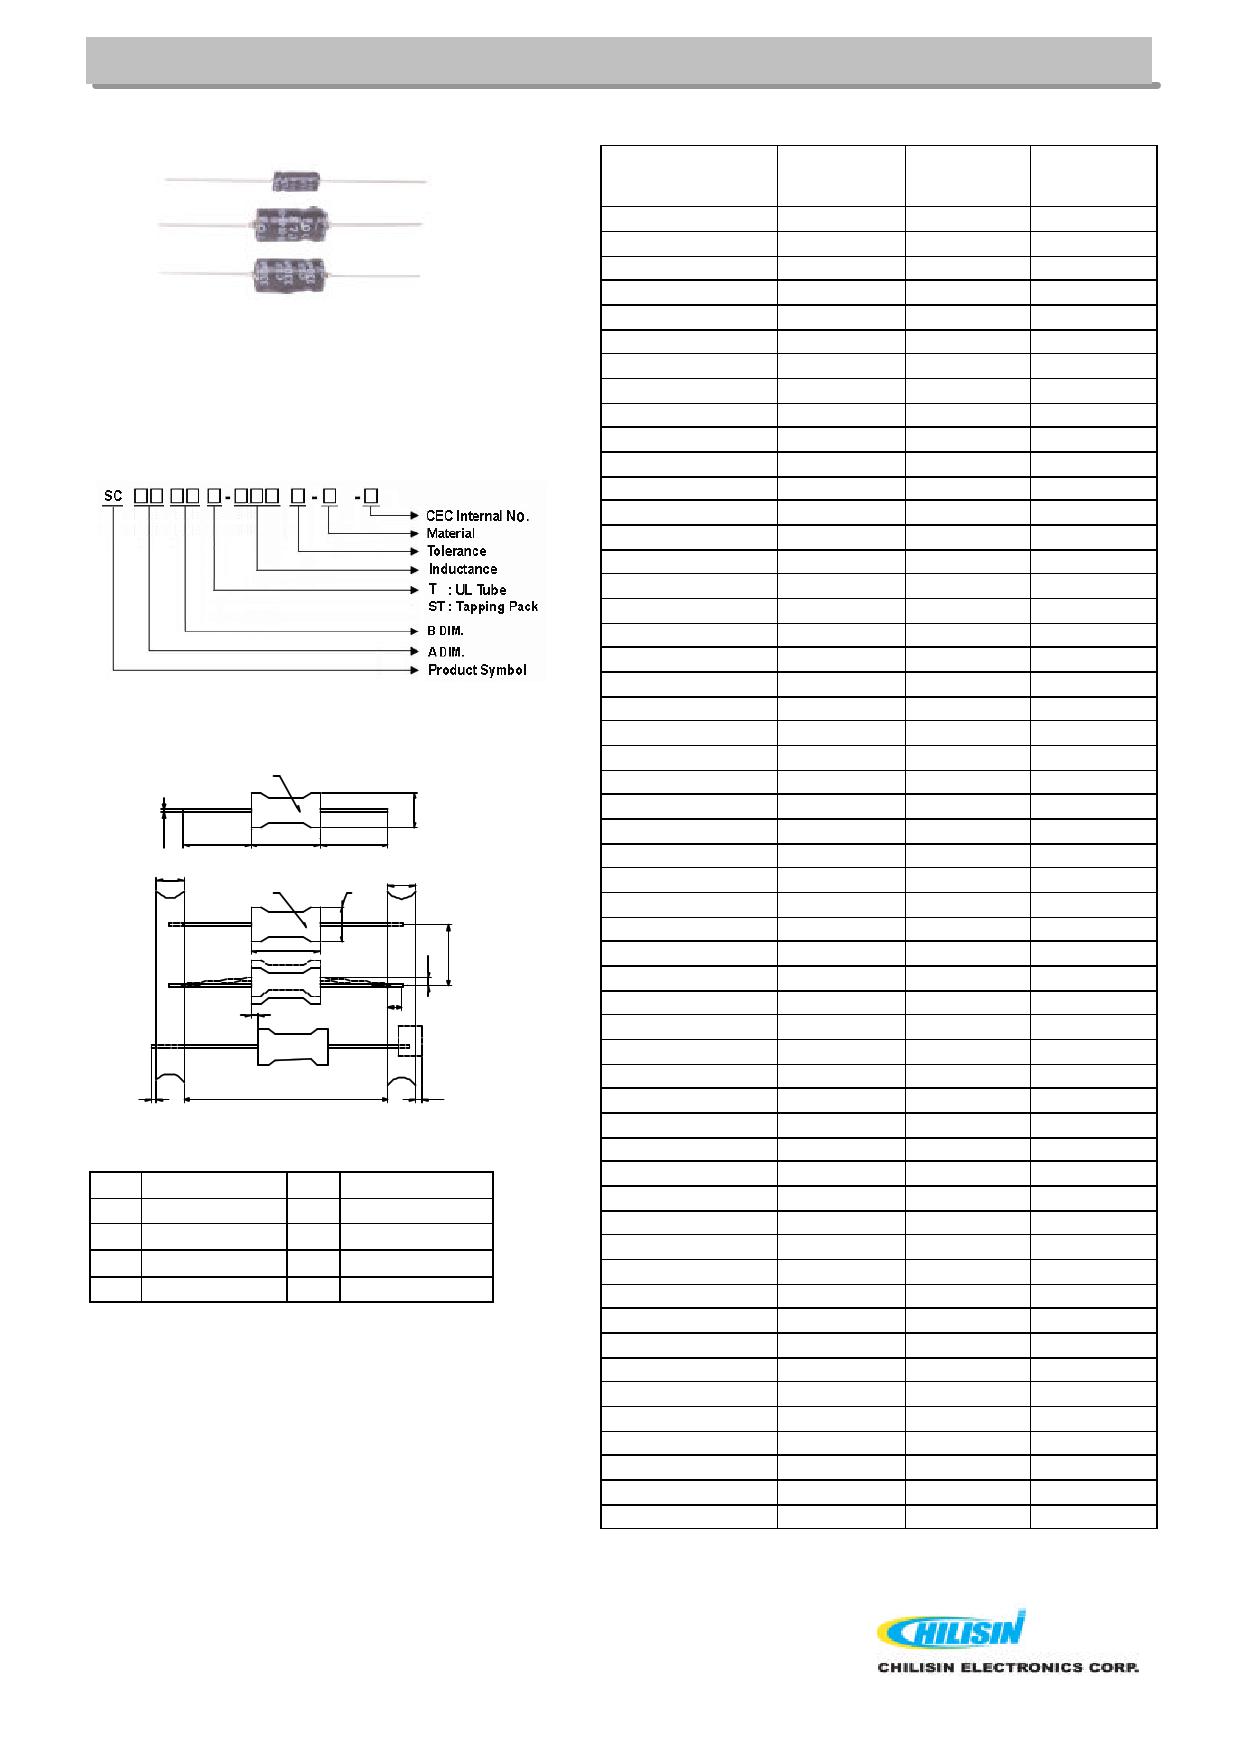 SC1223 데이터시트 및 SC1223 PDF